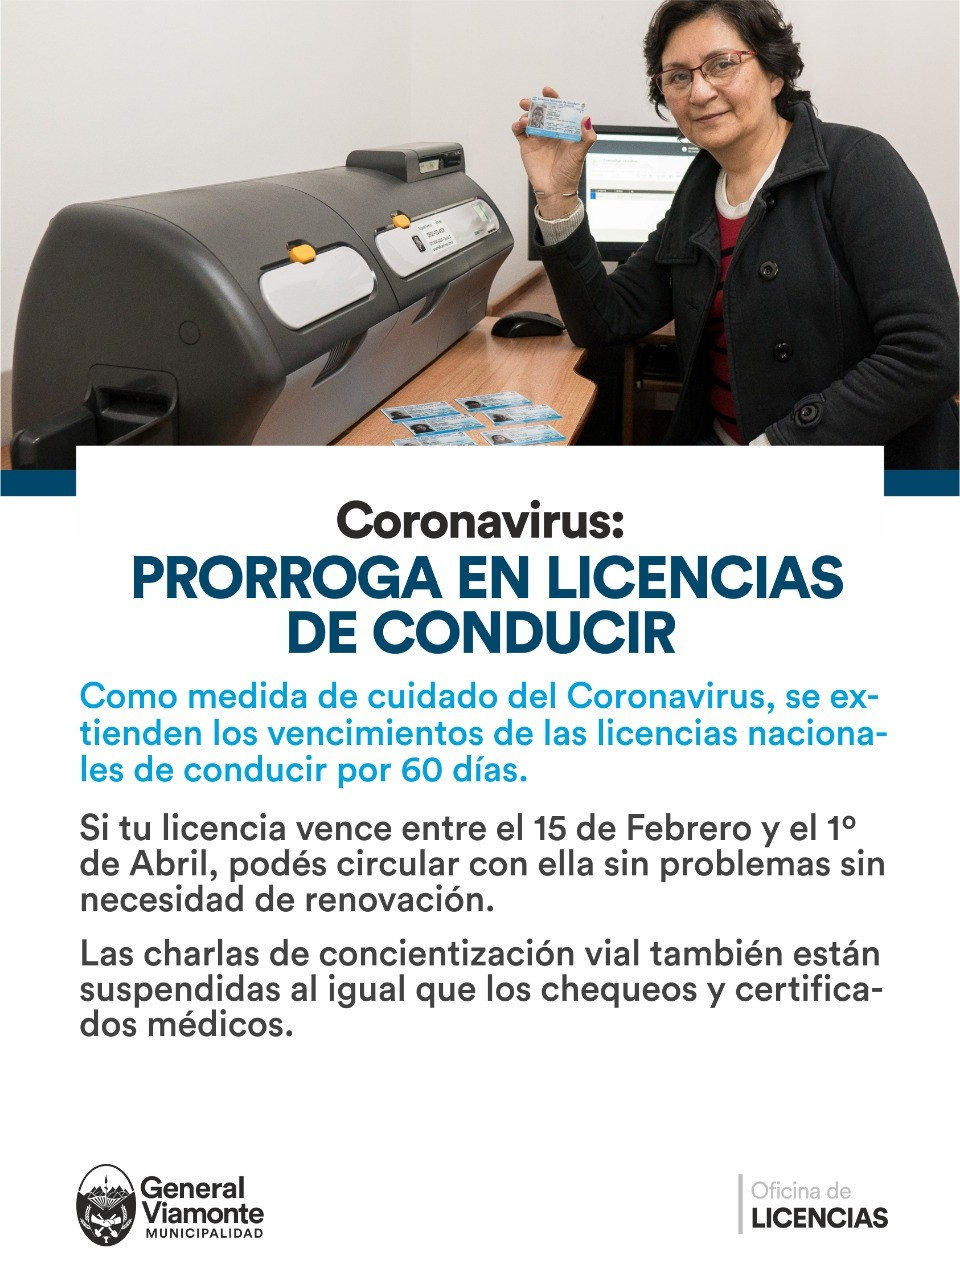 Coronavirus: PRORROGA EN LICENCIAS DE CONDUCIR